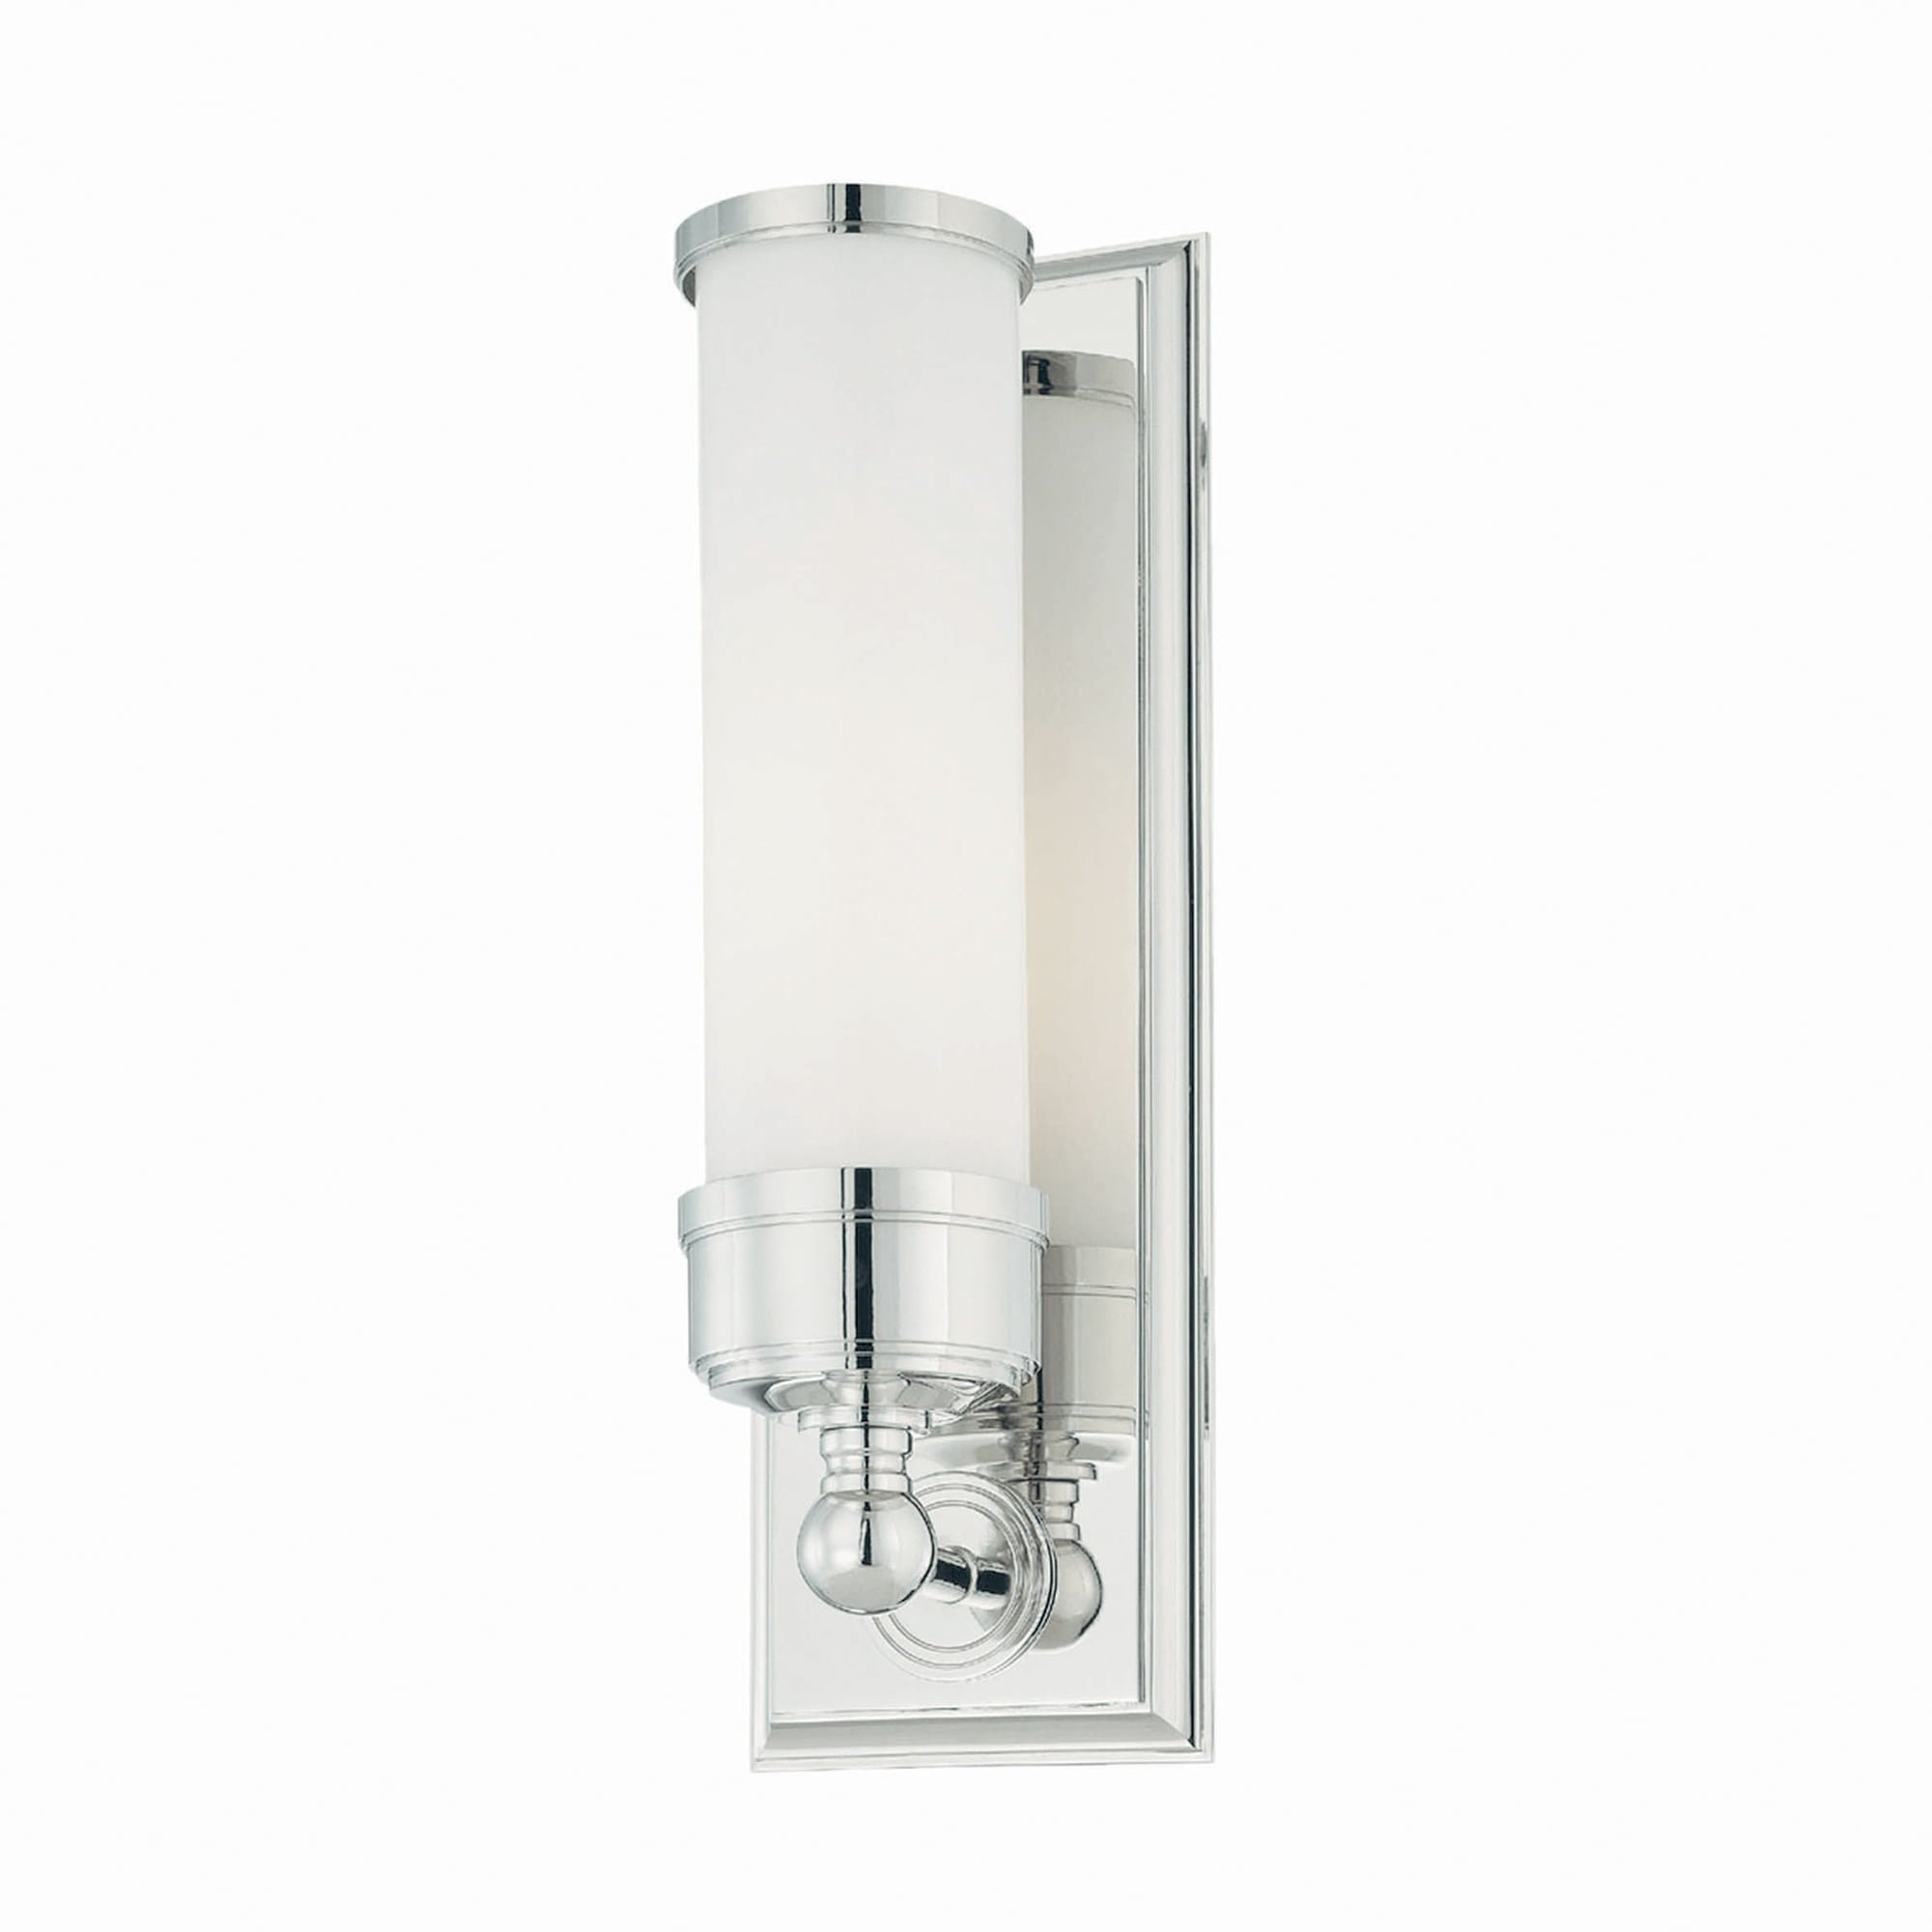 Elstead BATH/WS1 Bathroom Worcester 1lt Wall Light